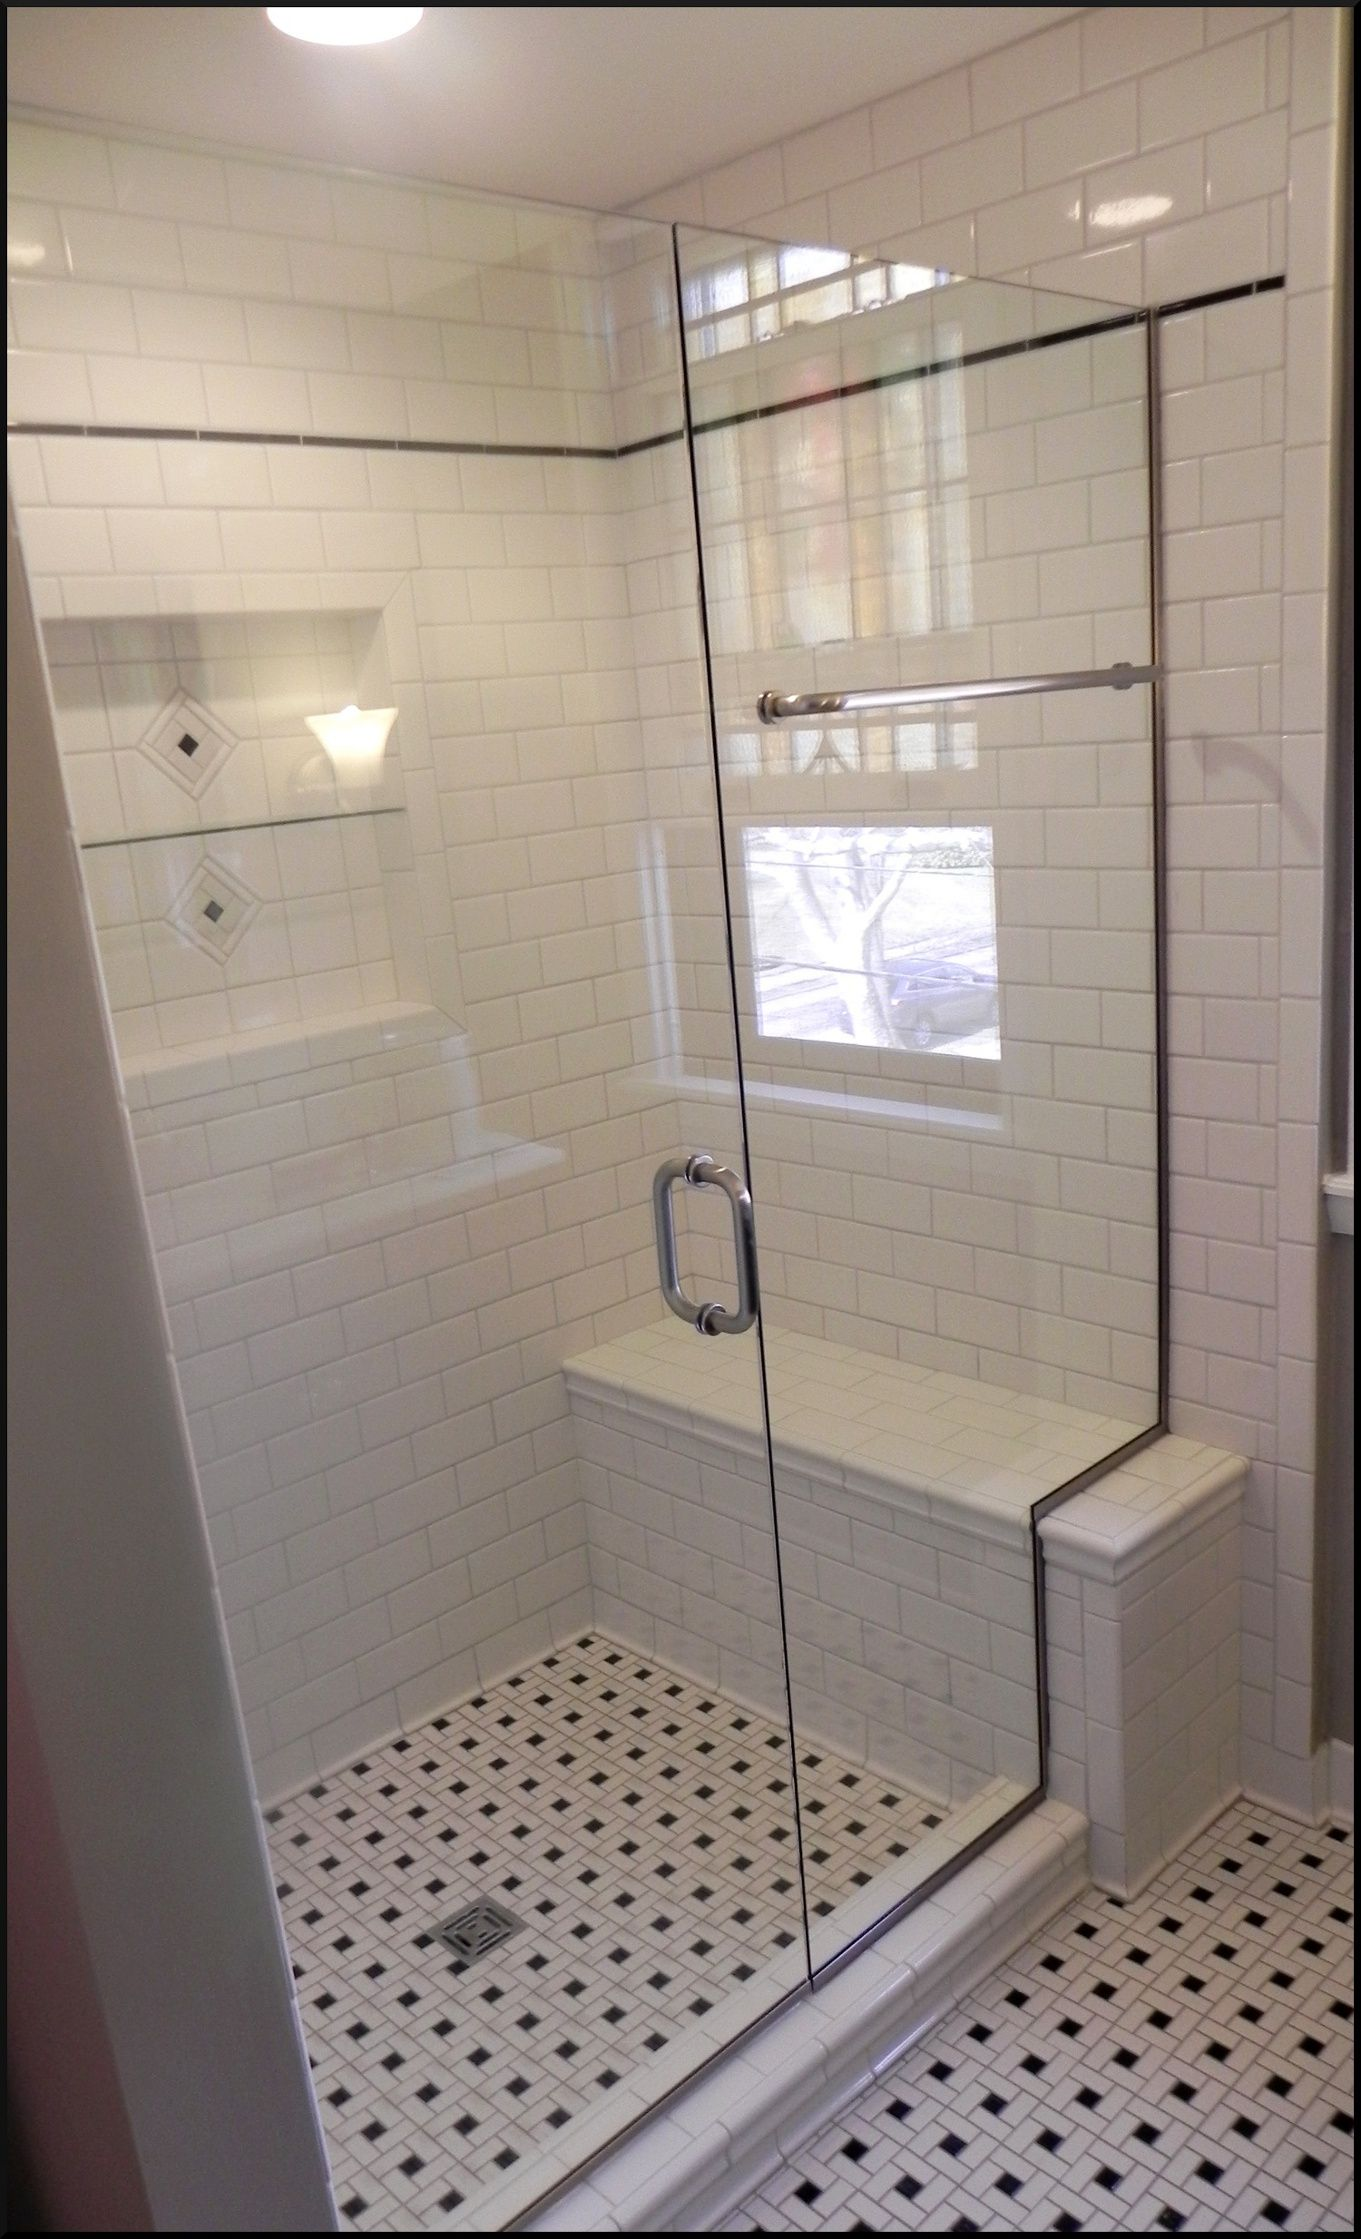 Shower Enclosures with Seat | Glass Shower Enclosures | bathroom ...